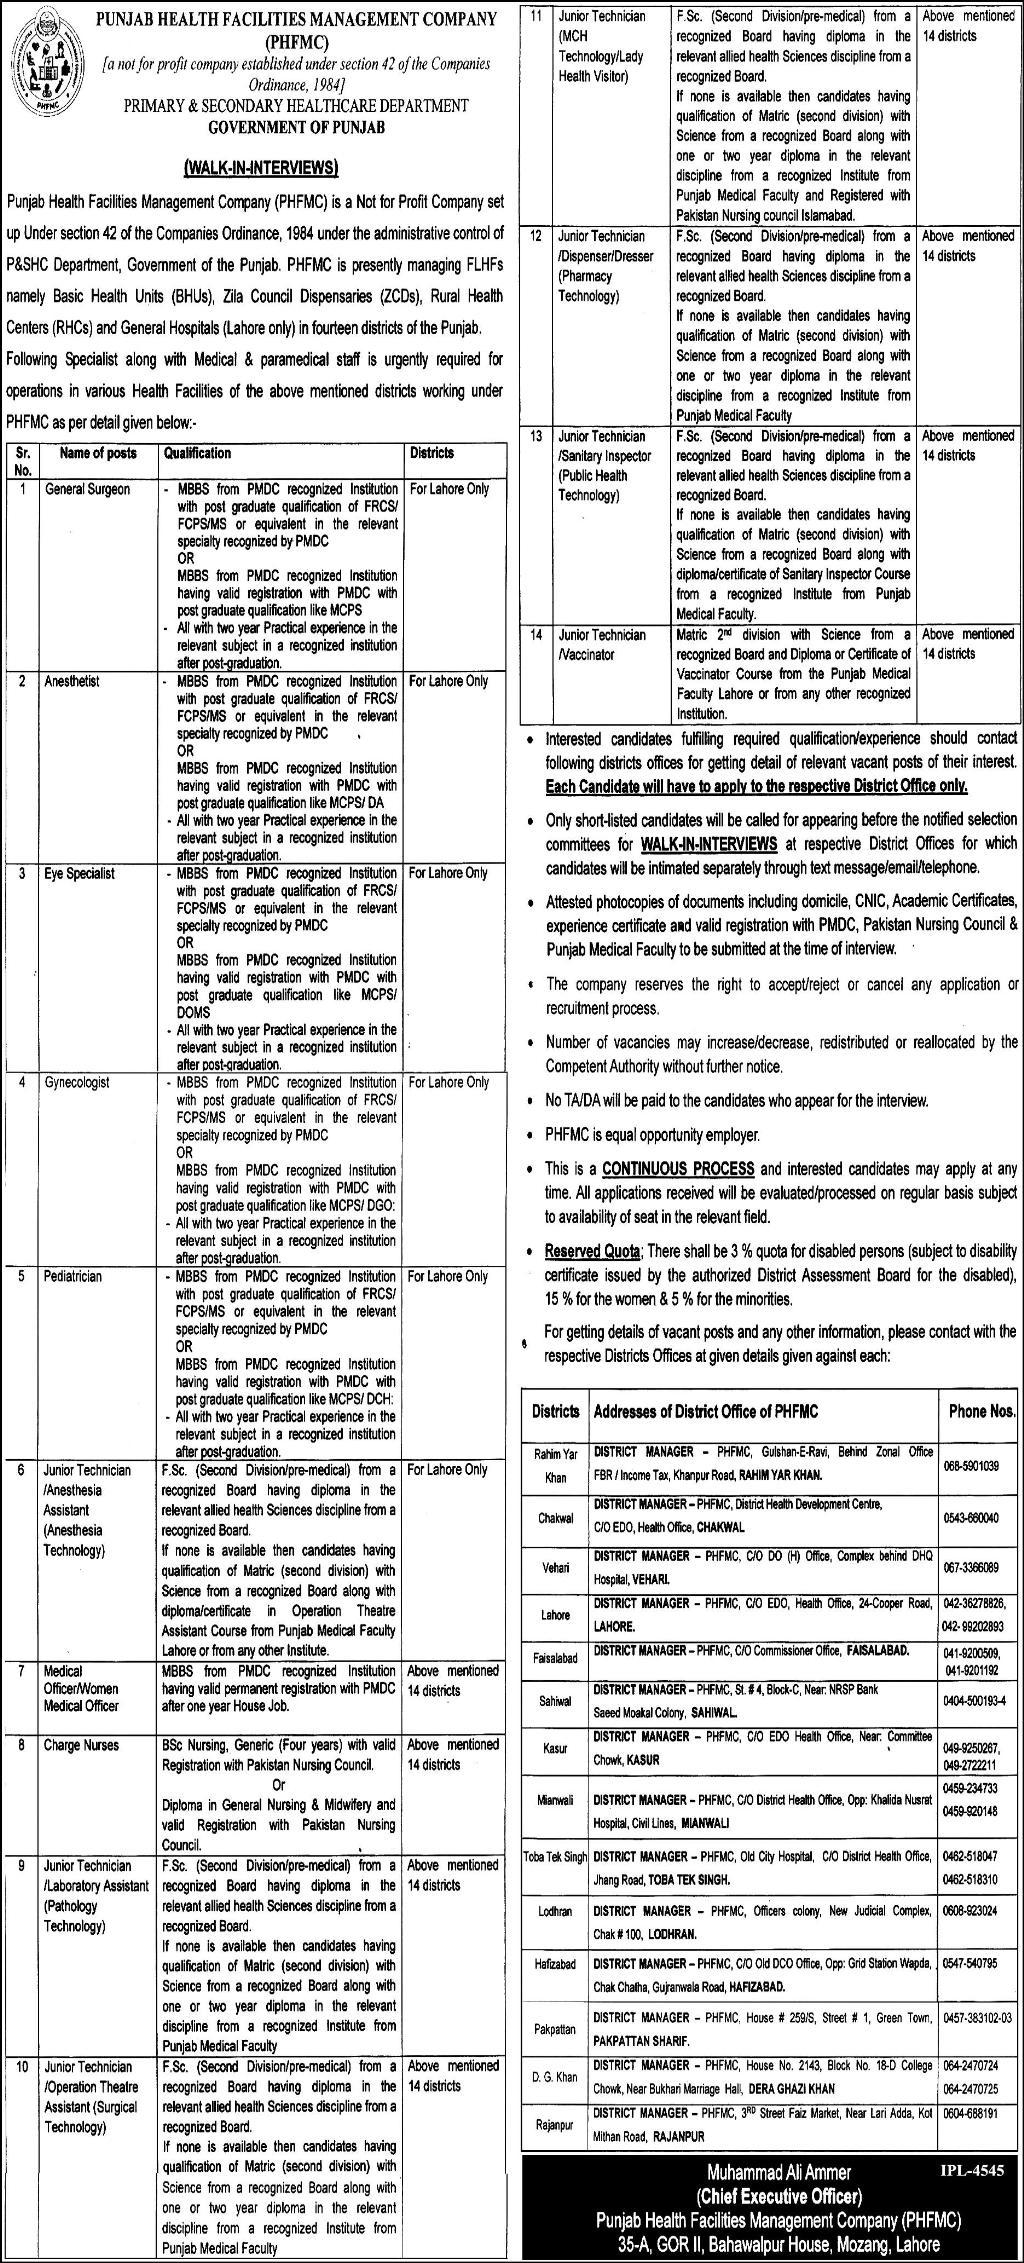 Punjab Health Facilities Management Company New Jobs Daily Express Newspaper 11 April 2018